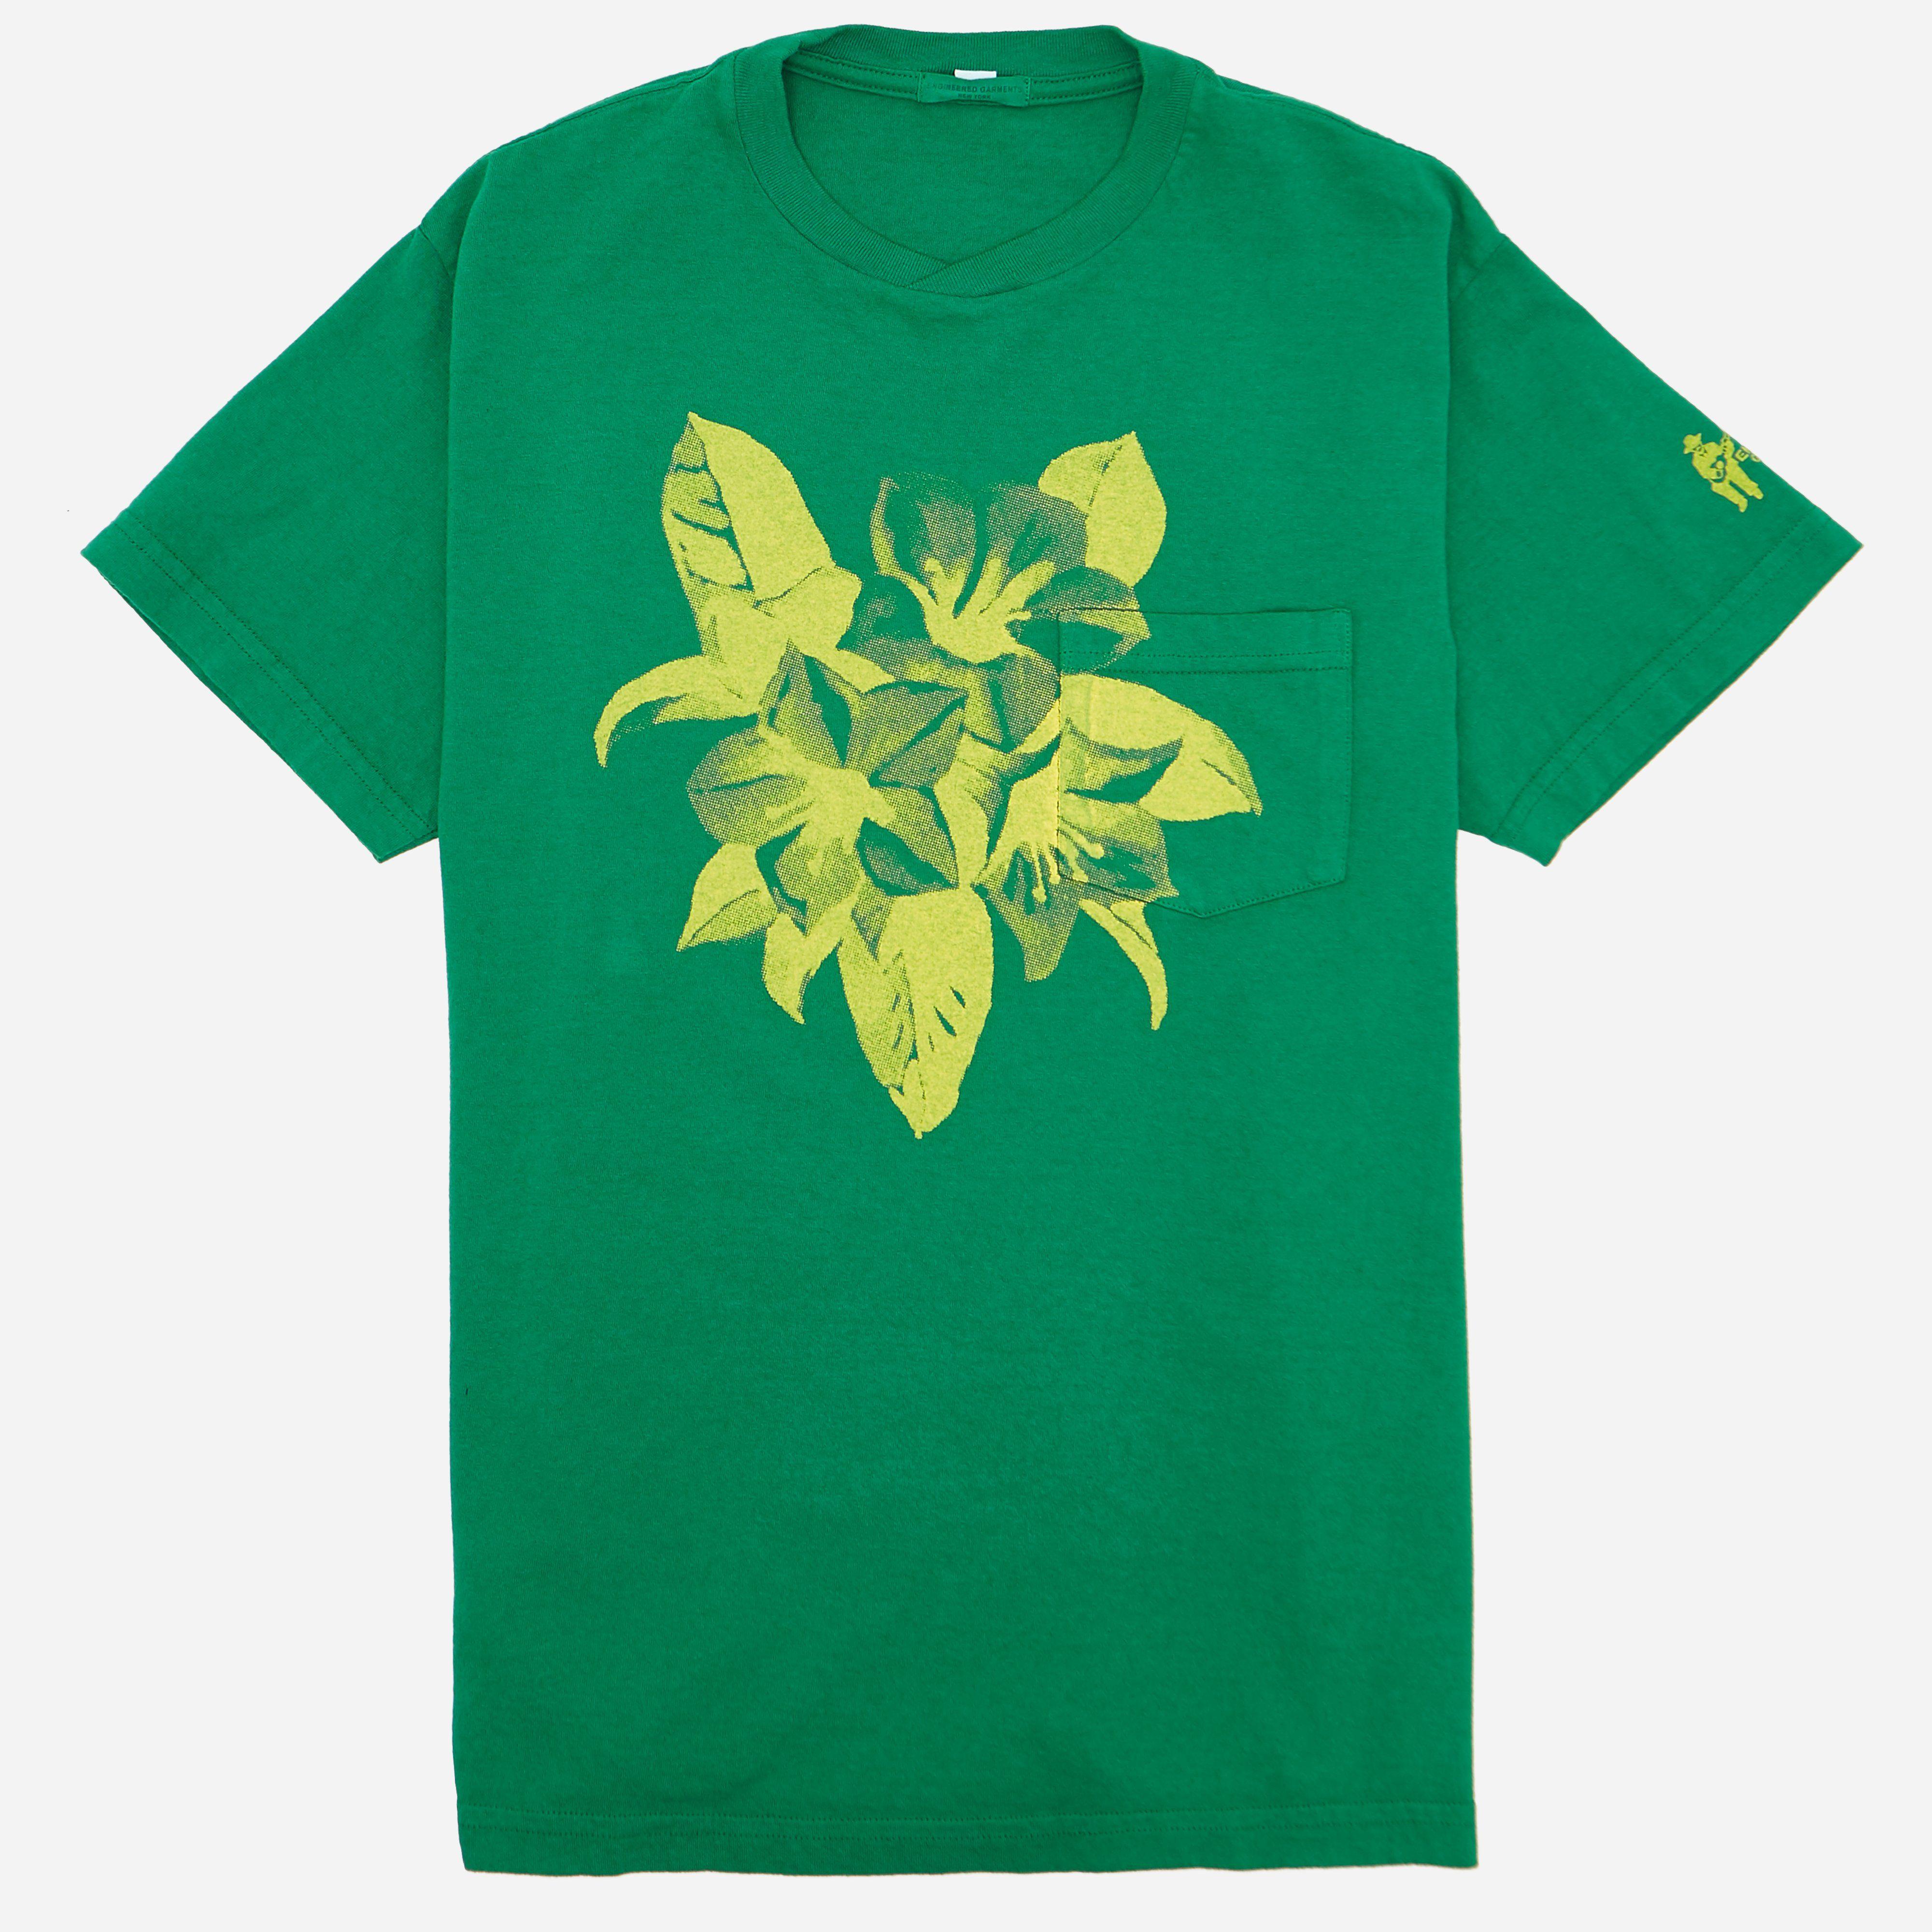 Engineered Garments Kelly Floral Printed T-shirt